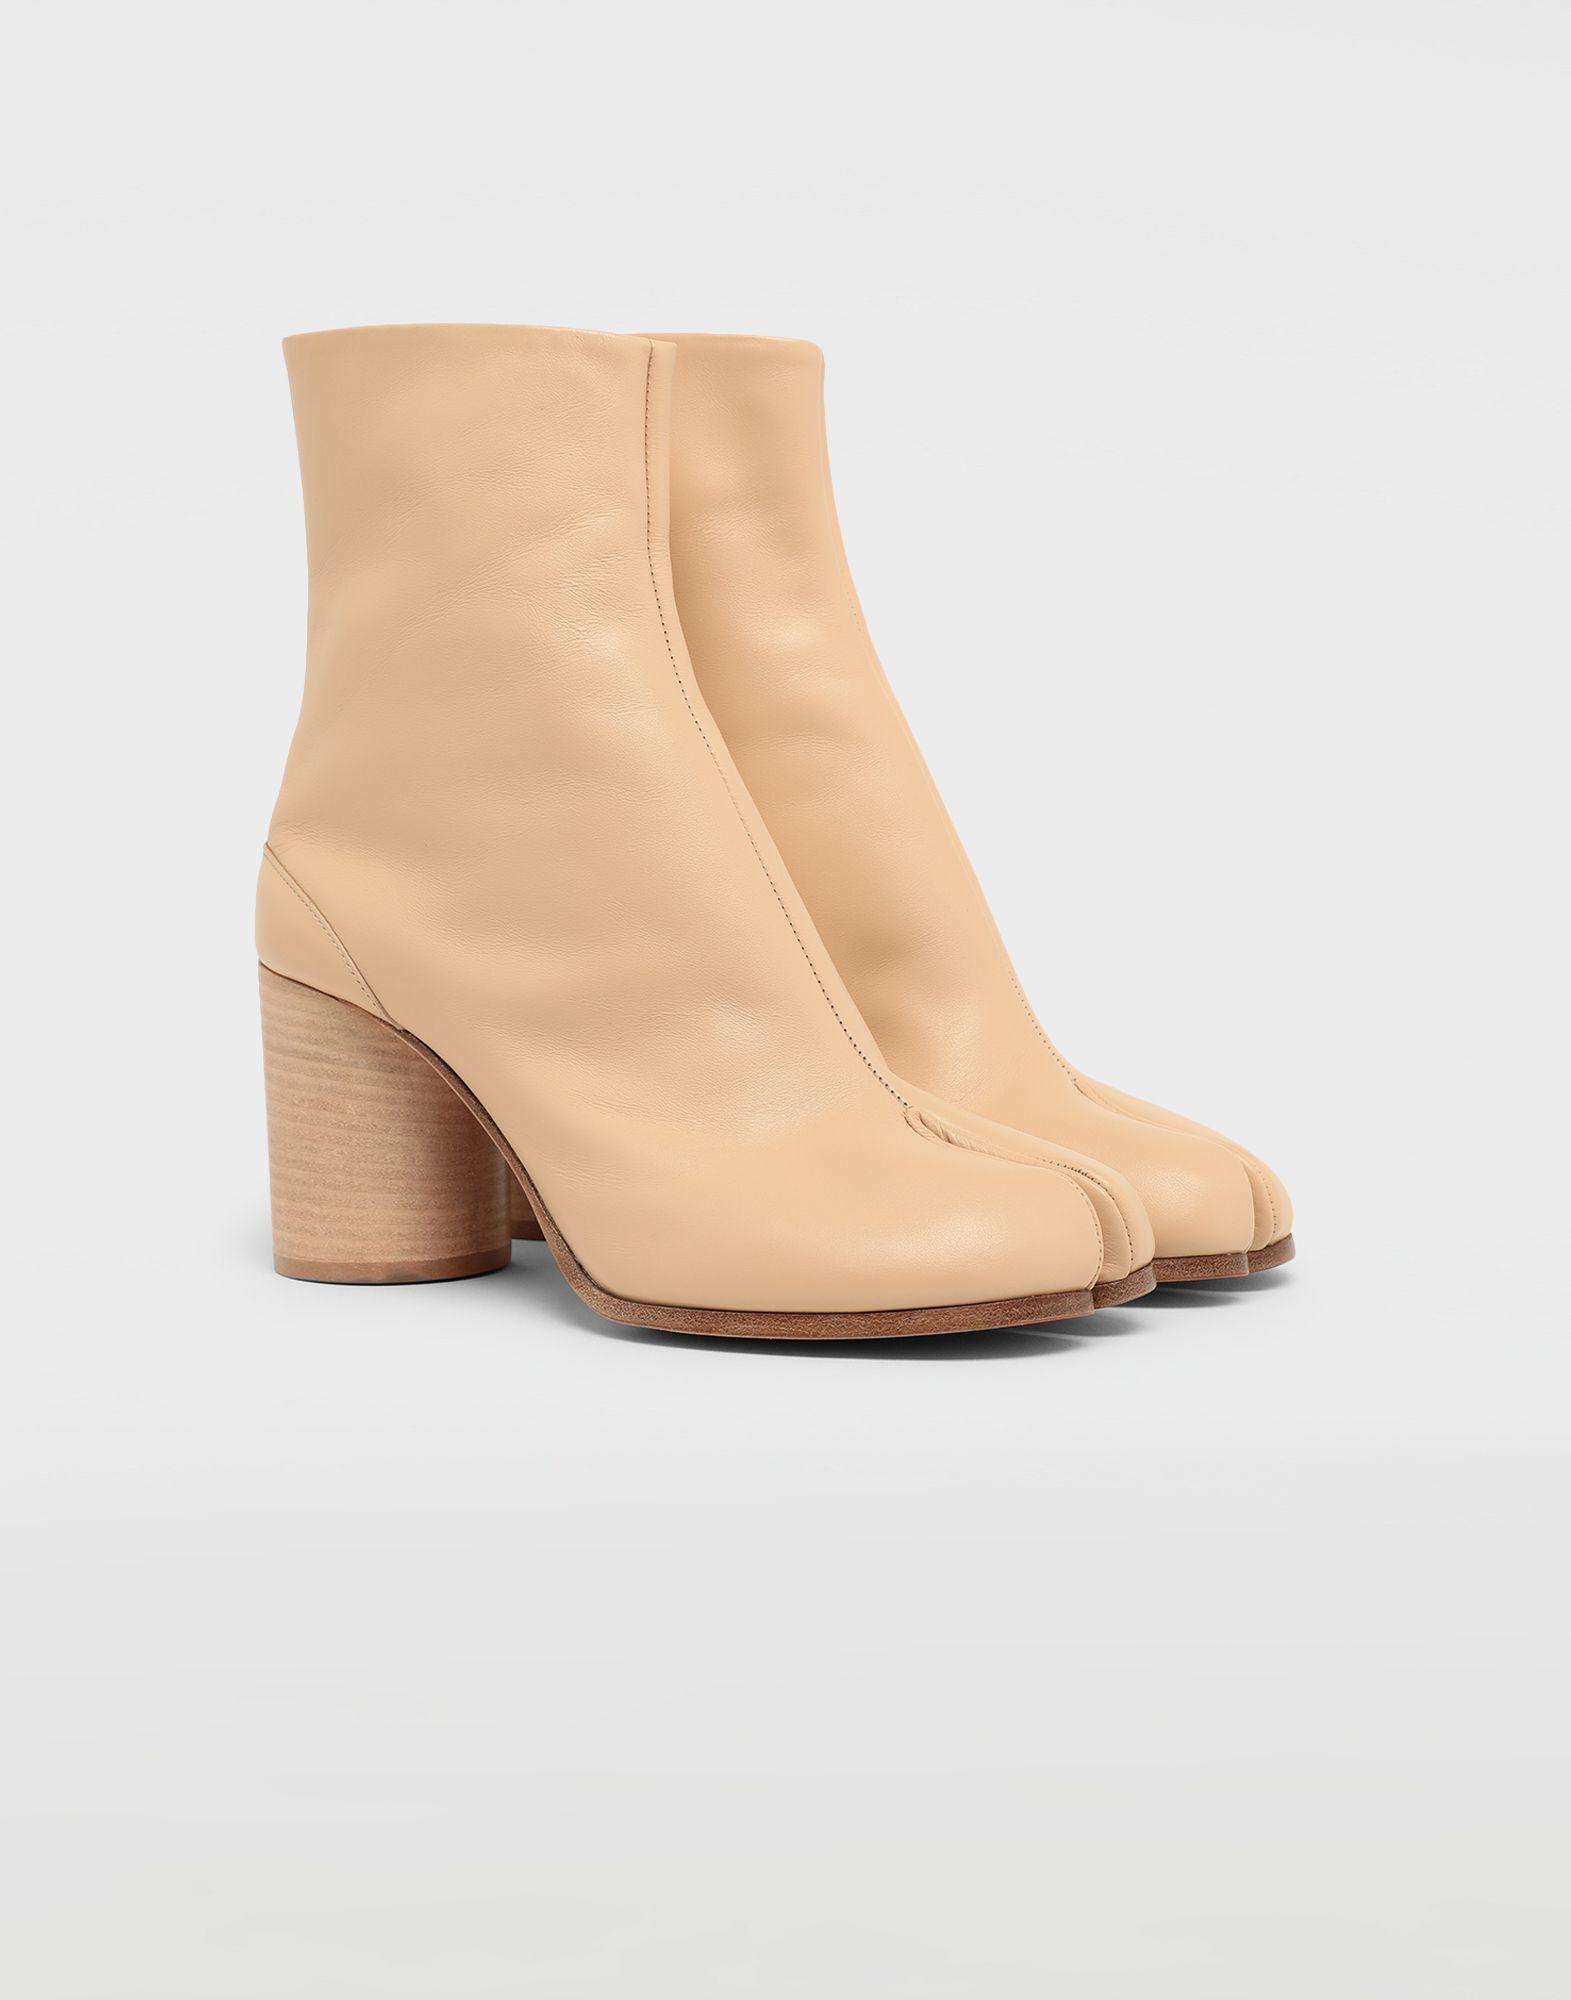 Maison Margiela Tabi Boots - Trendy